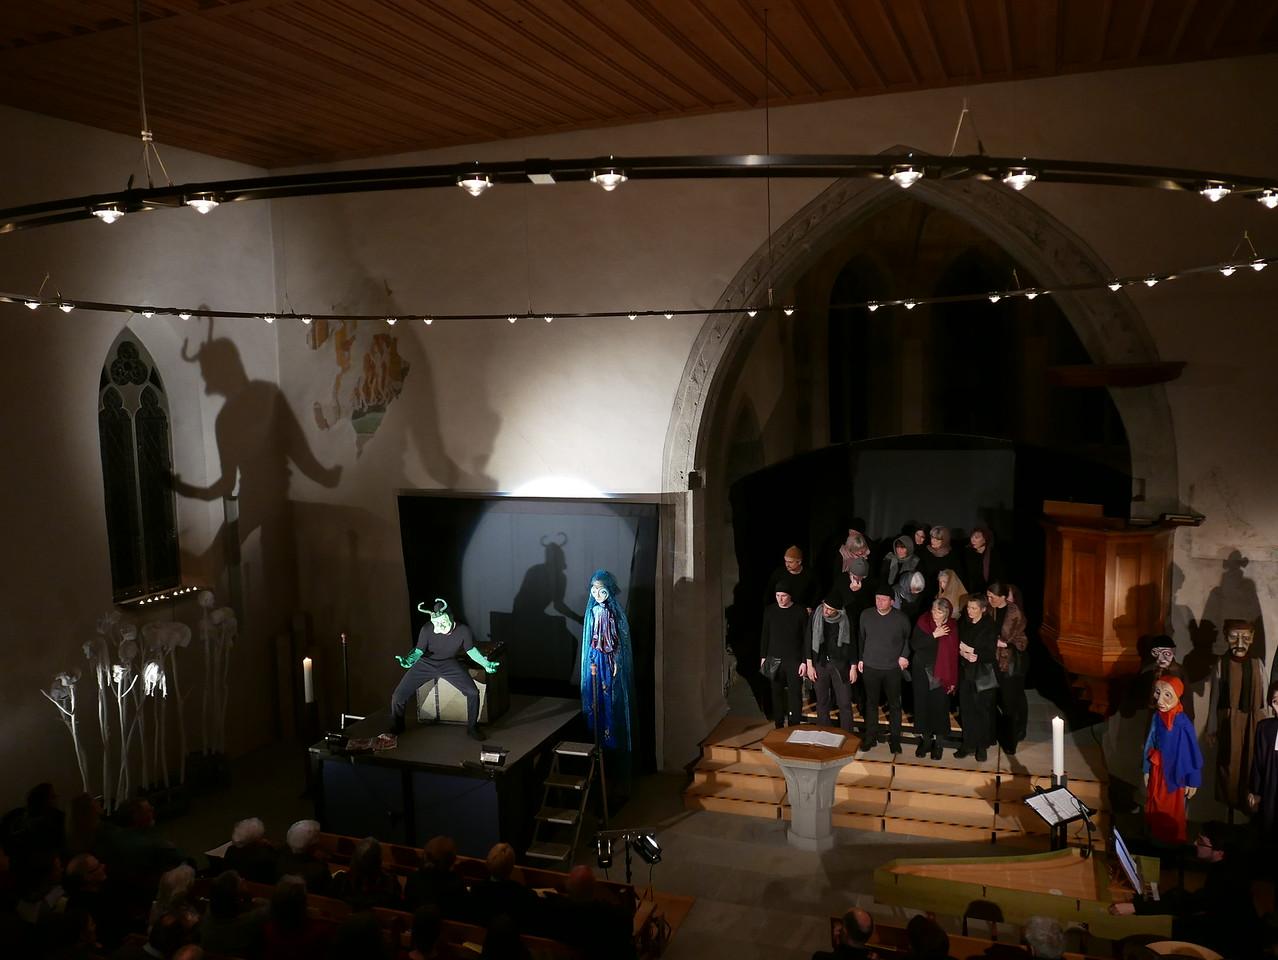 @ 28.03.18, 20:30 / kath. Kirche Veltheim-Winterthur